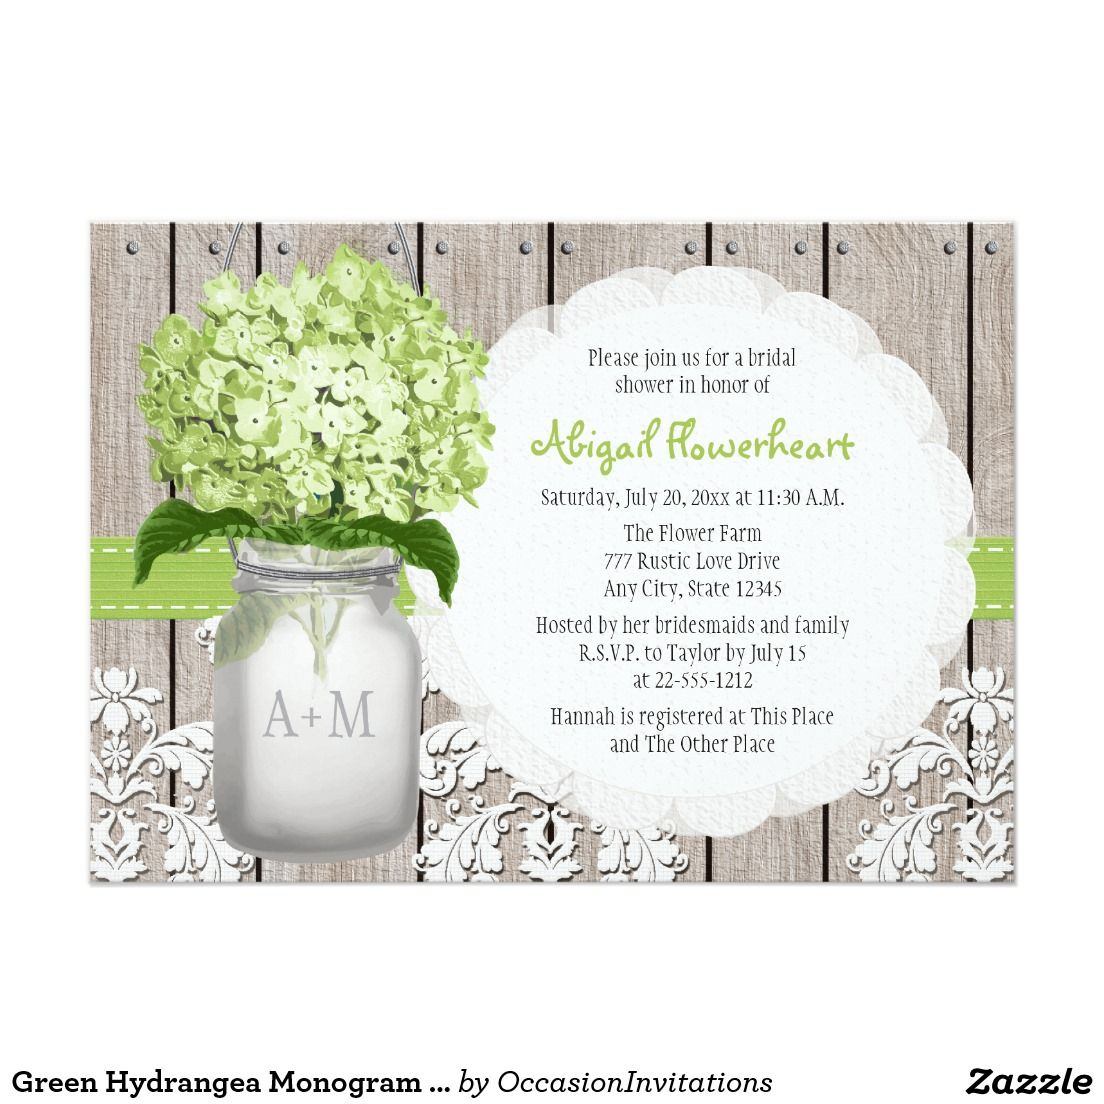 Green Hydrangea Monogram Mason Jar Bridal Shower